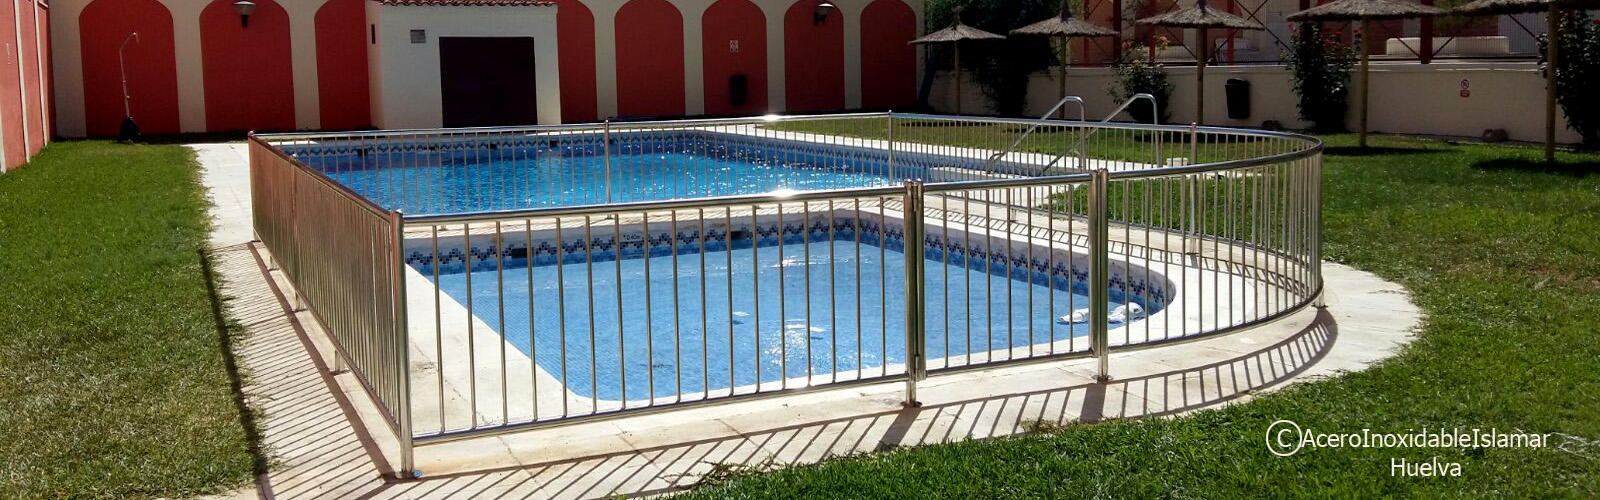 Baranda piscina acero inoxidable islamar huelva acero inoxidable islamar huelva - Piscinas de acero inoxidable ...